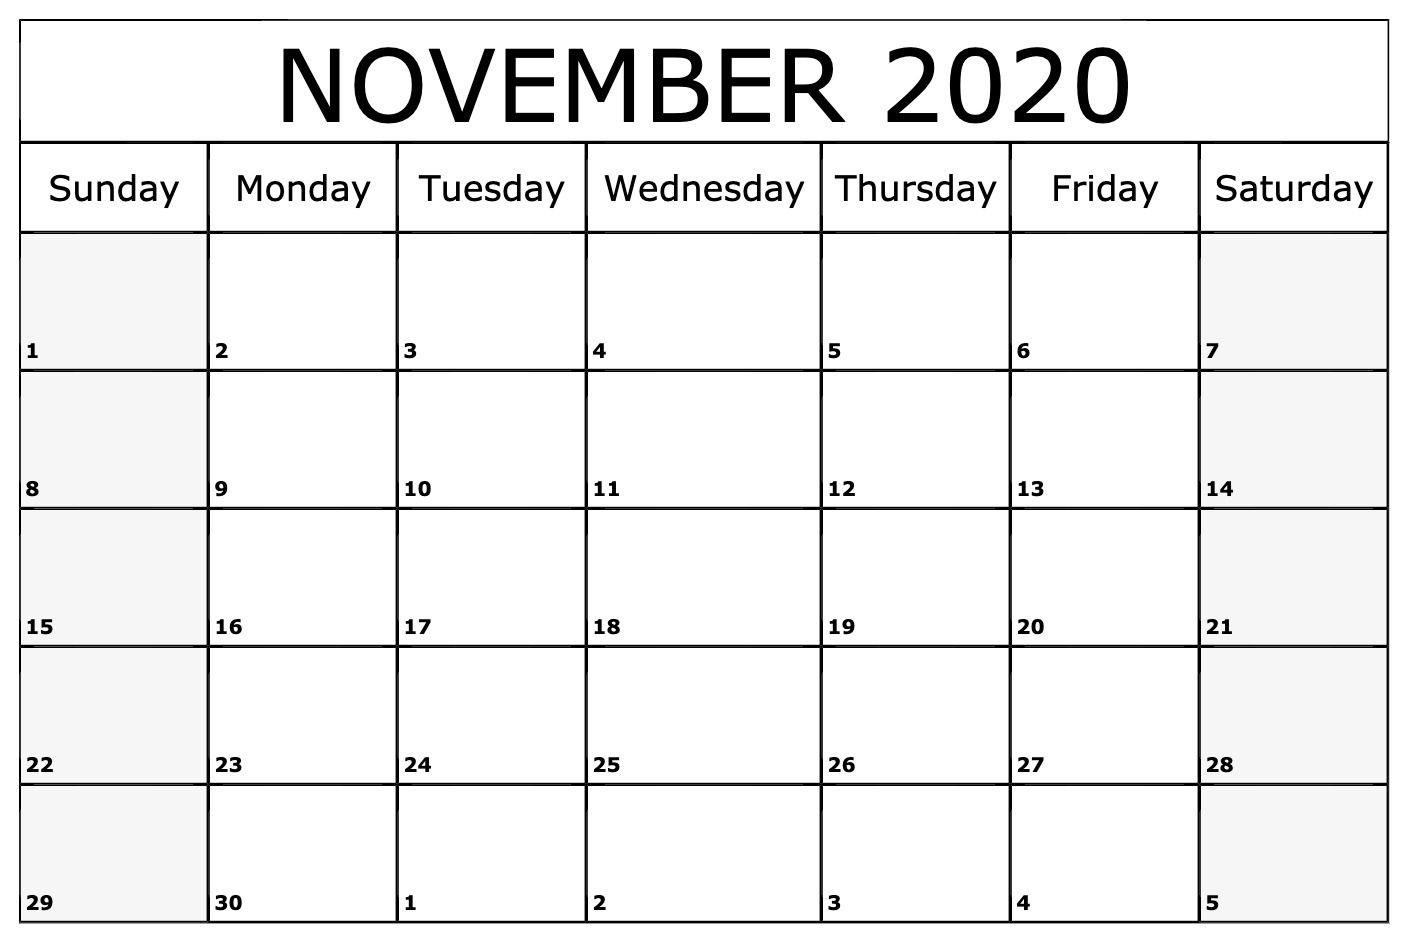 November 2020 Calendar Printable Template | July Calendar with regard to Bring Up Calander For October And November 2020